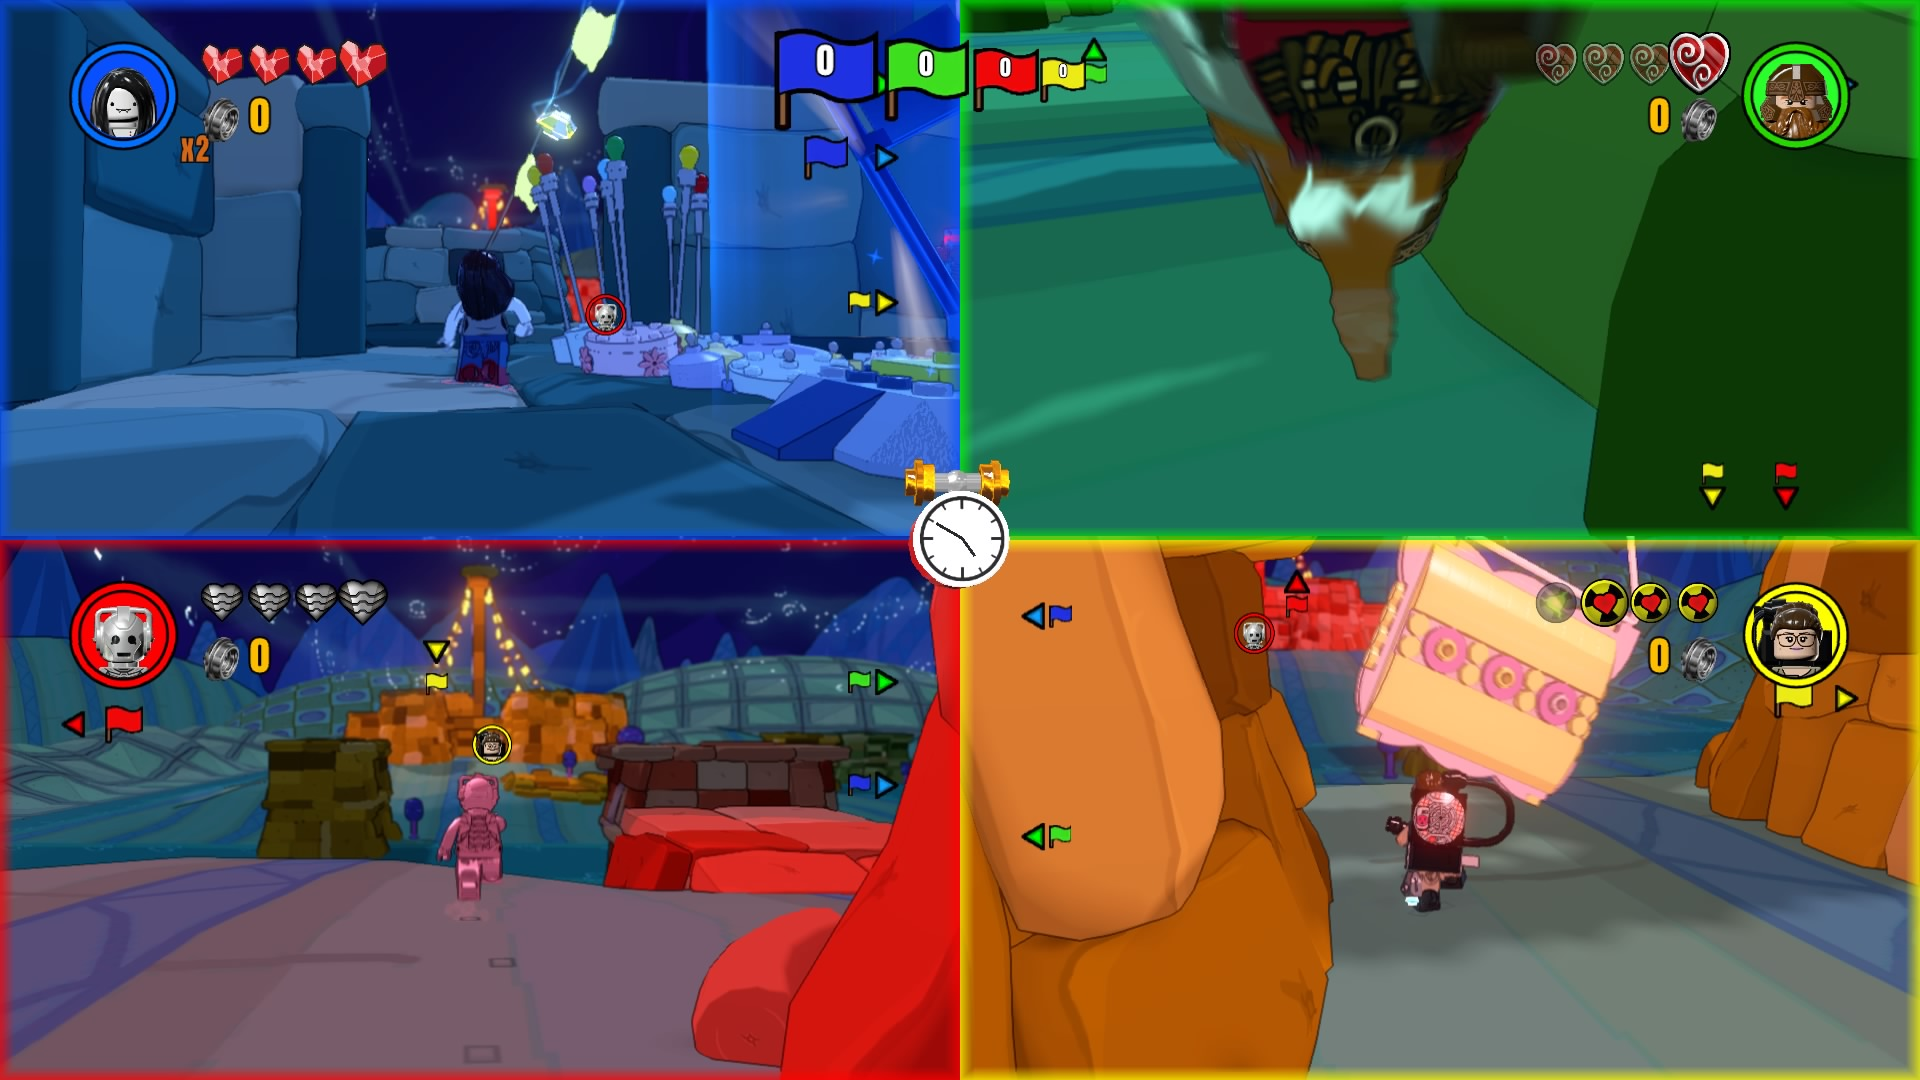 Adventure Time Ukulele - Neatorama